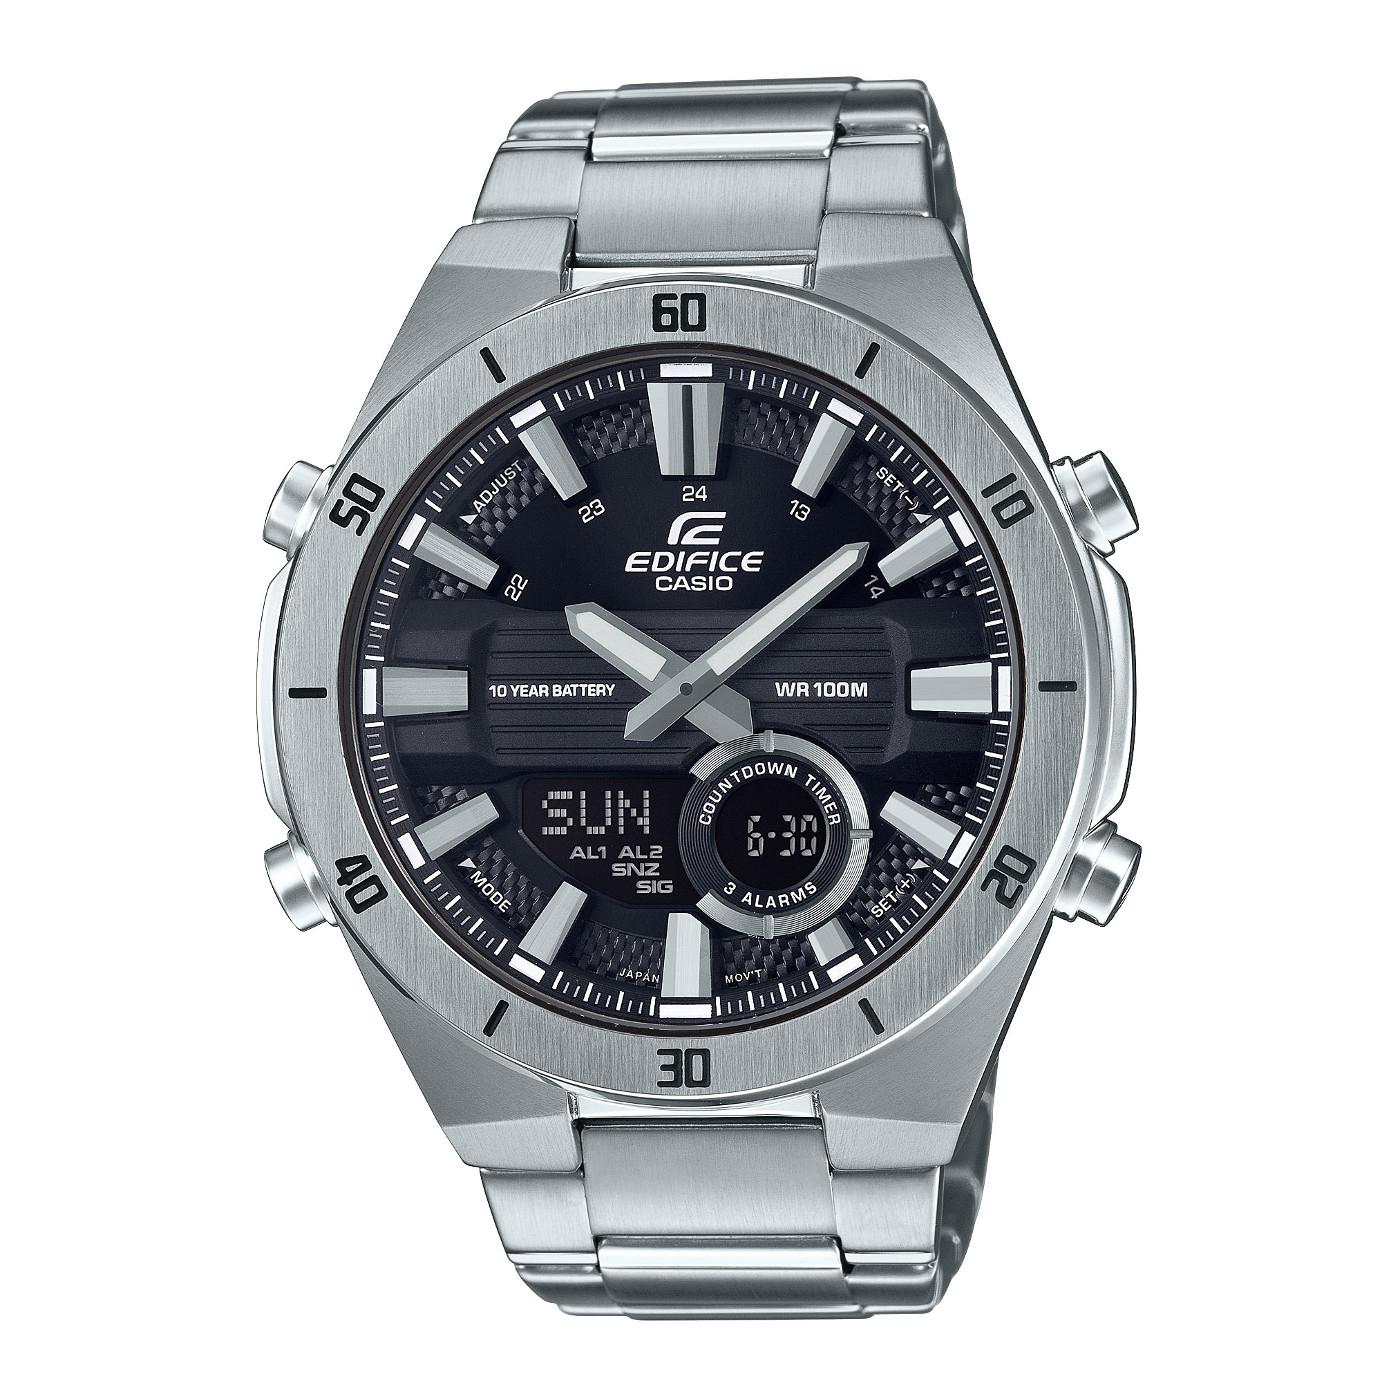 Afbeelding van Edifice Classic horloge ERA 110D 1AVEF